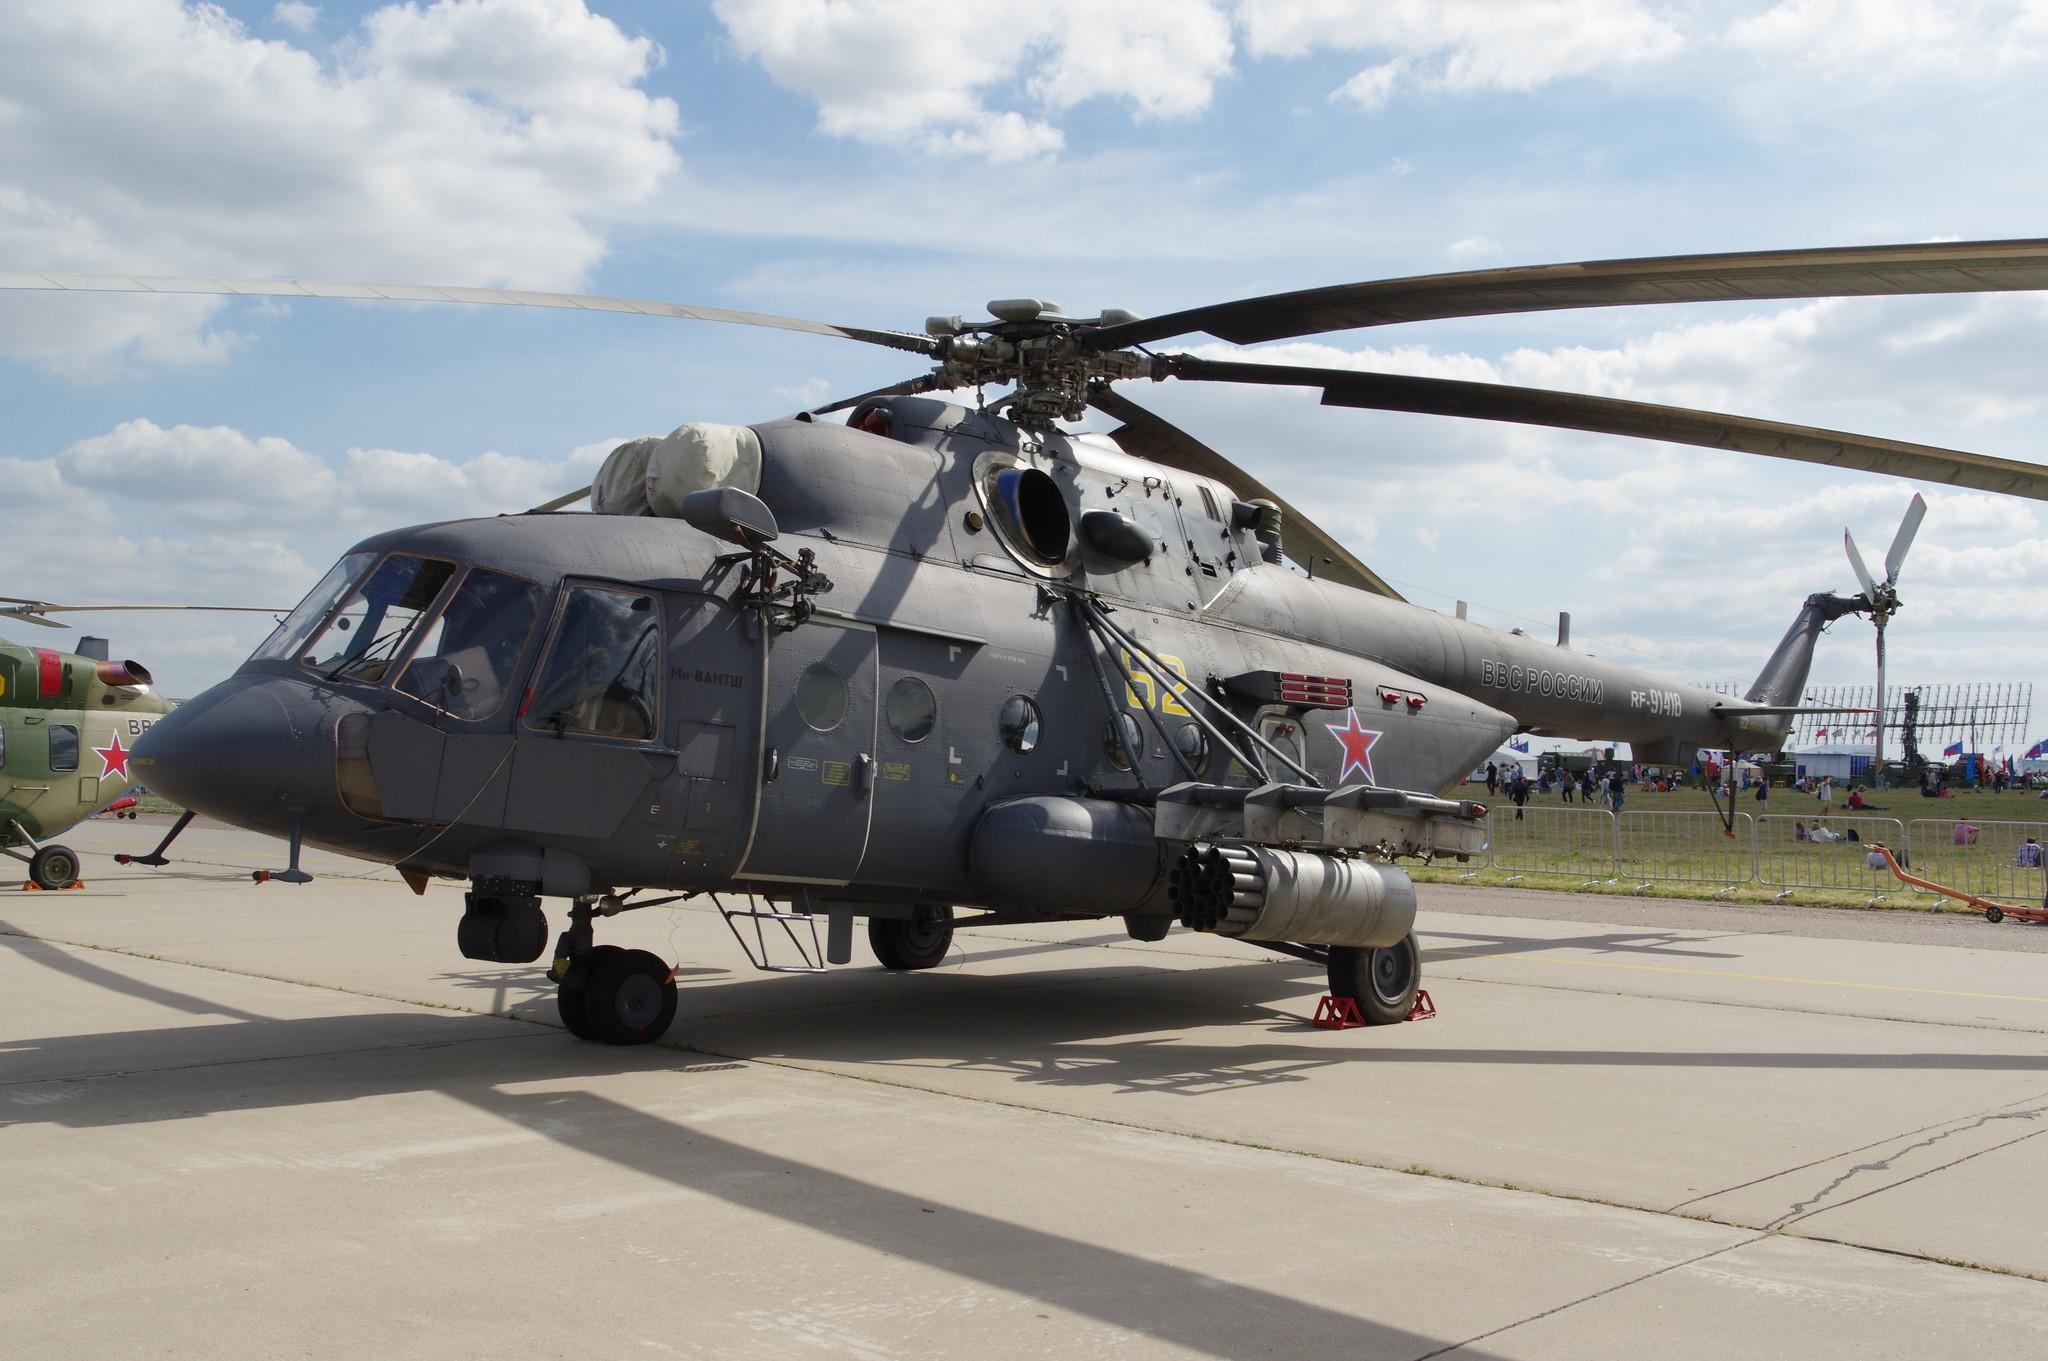 Транспортно-штурмовой вертолёт Ми-8АМТШ «Терминатор»